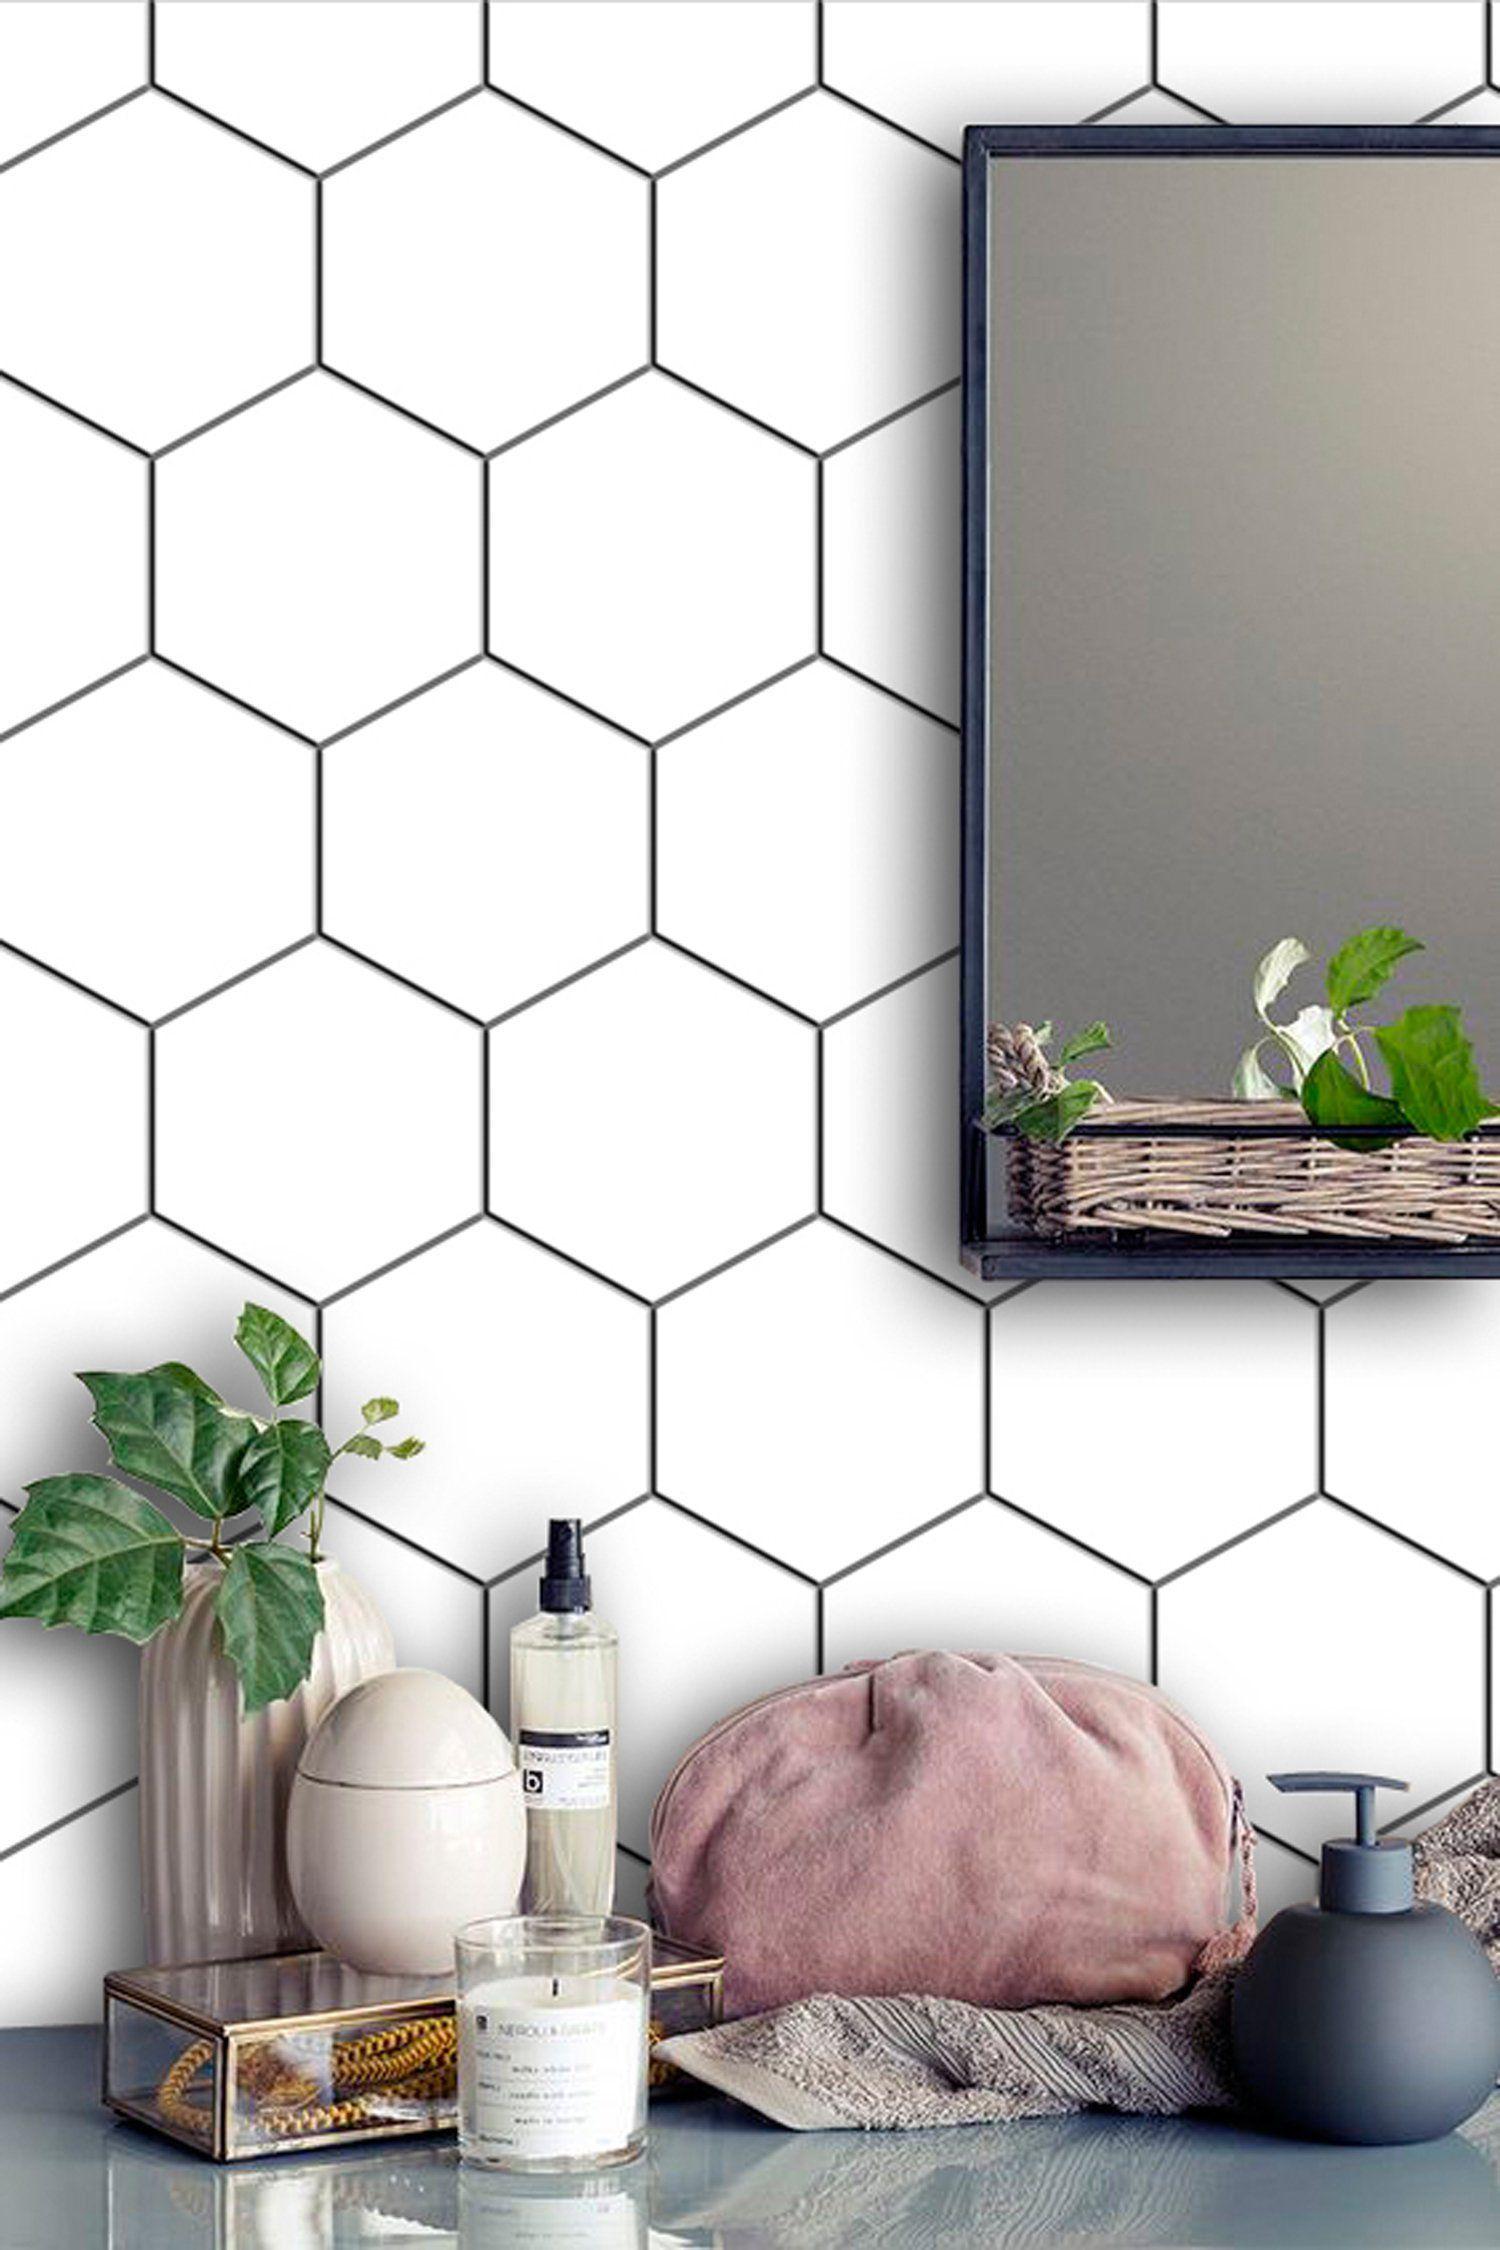 - Kitchen And Bathroom Splashback - Removable Vinyl Wallpaper - Hexa